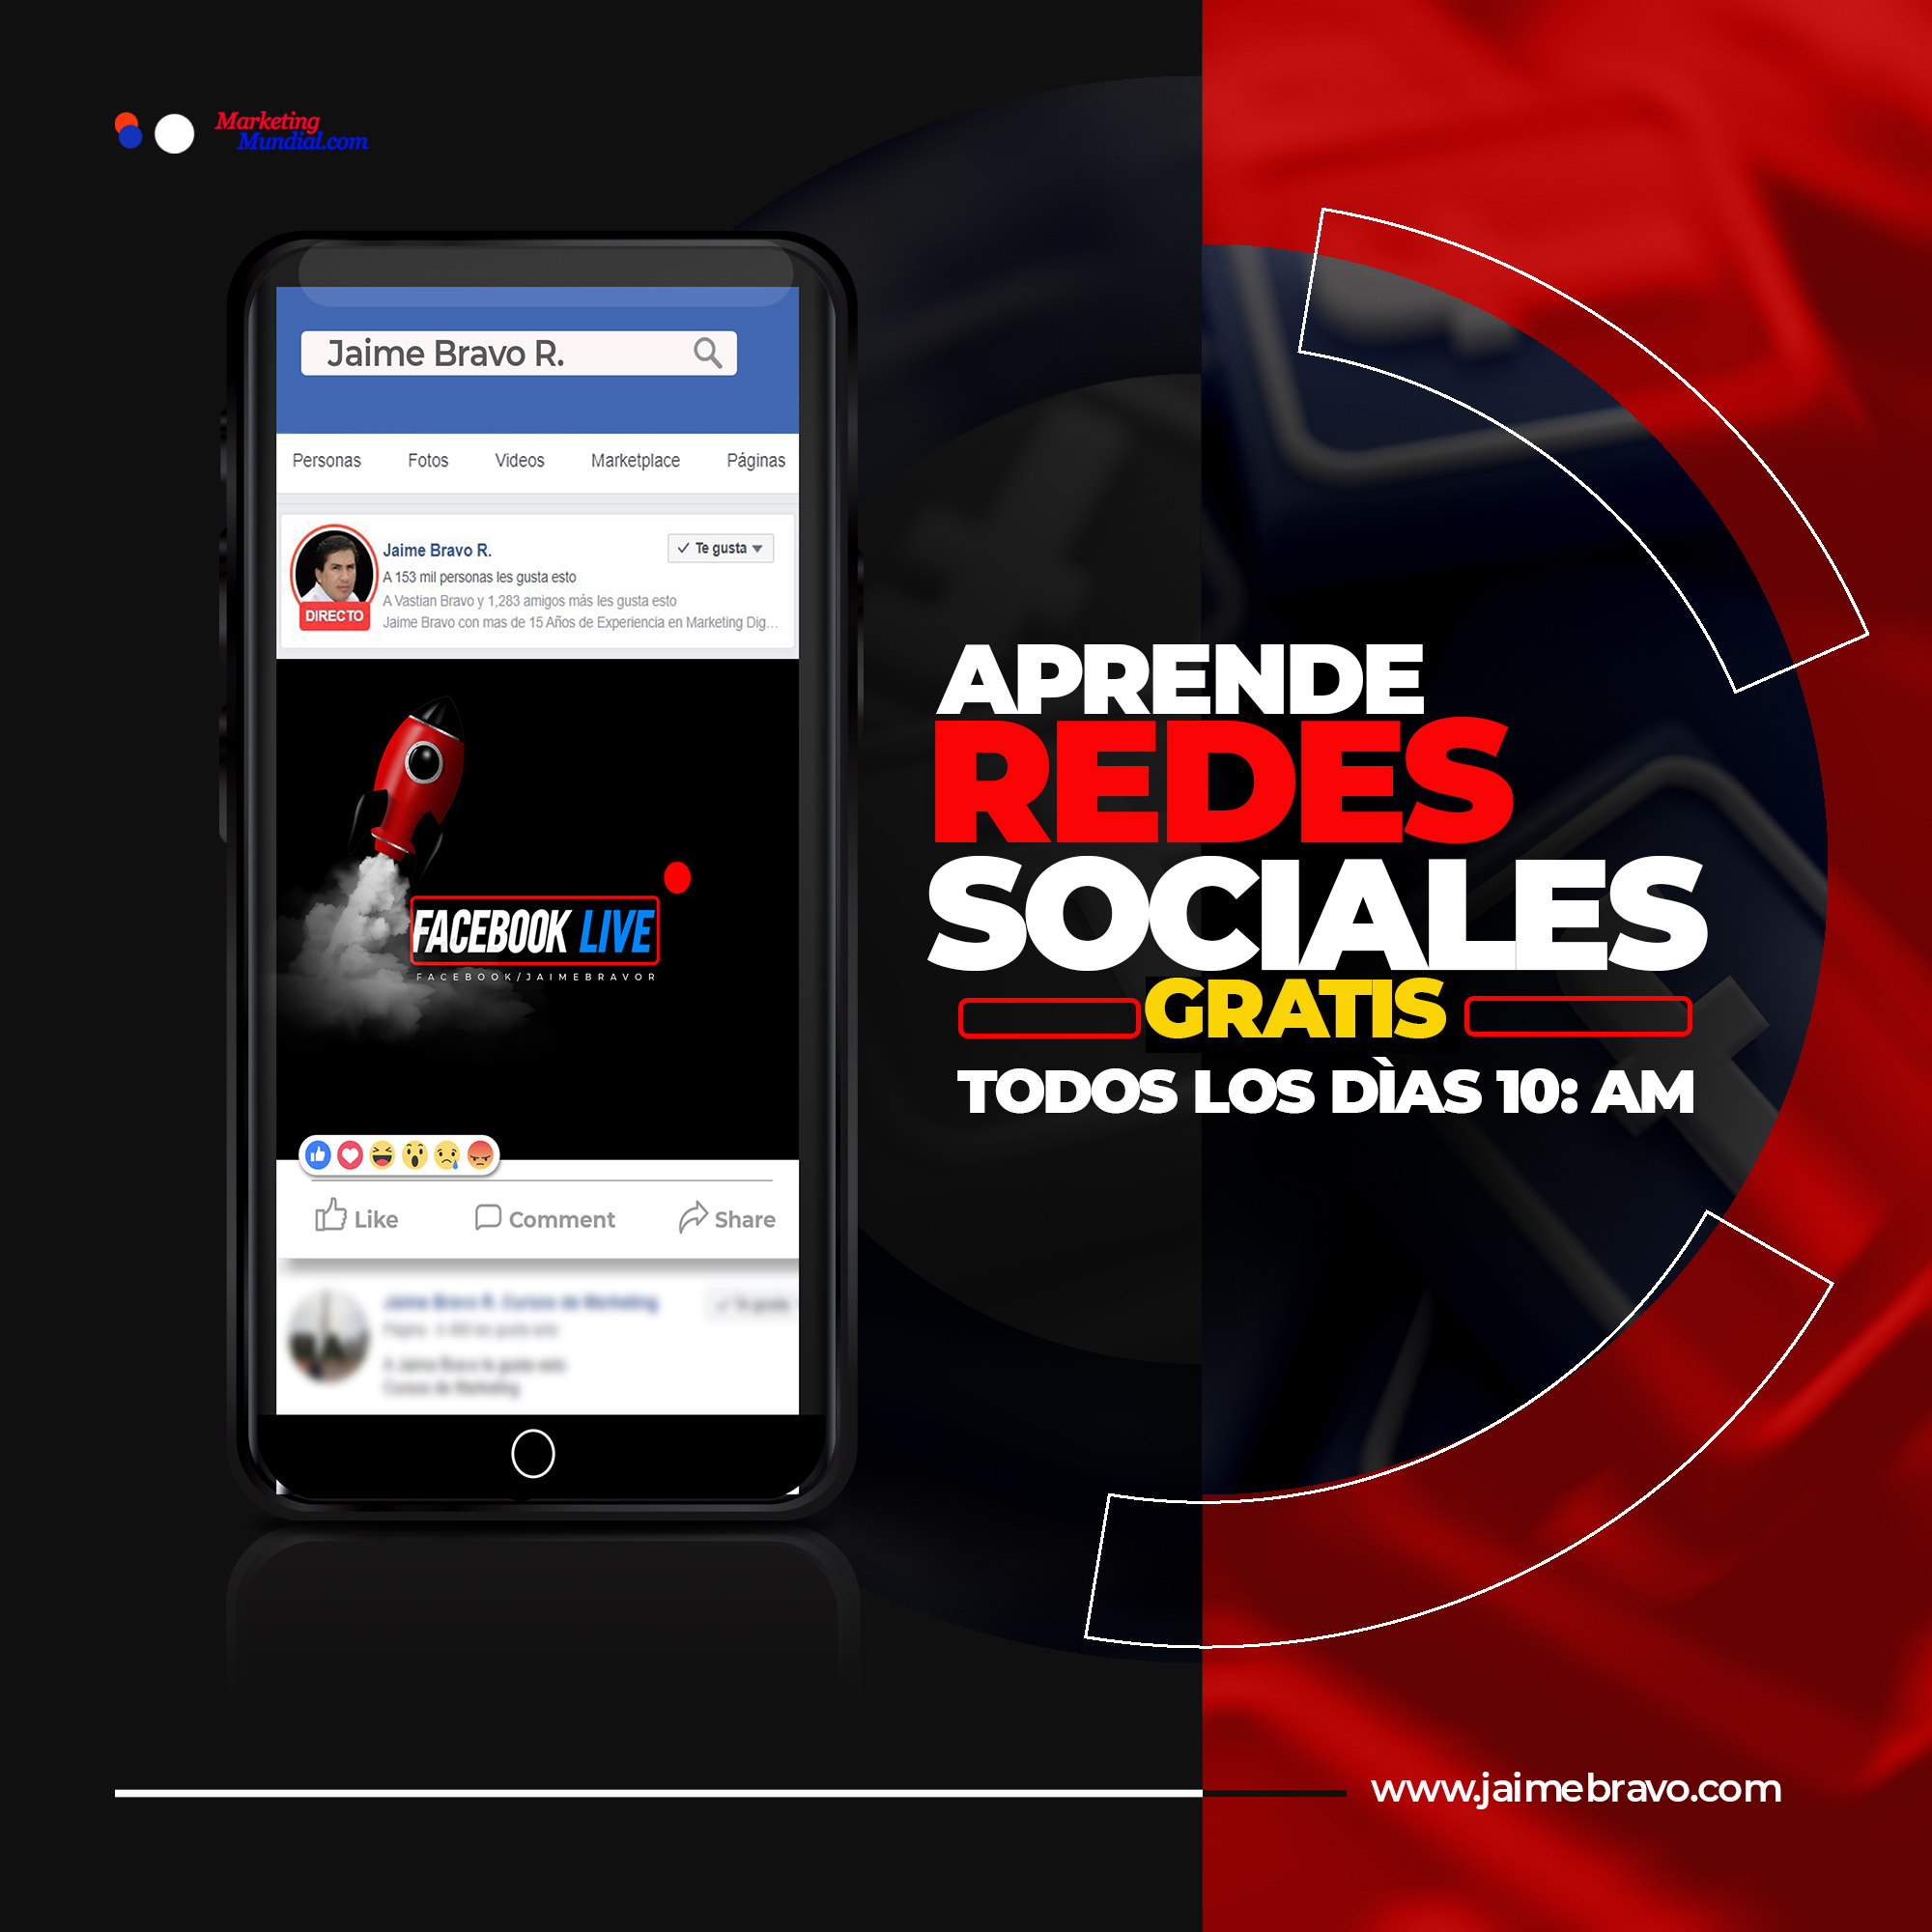 Jaime Bravo R Cursos de marketing digital gratis